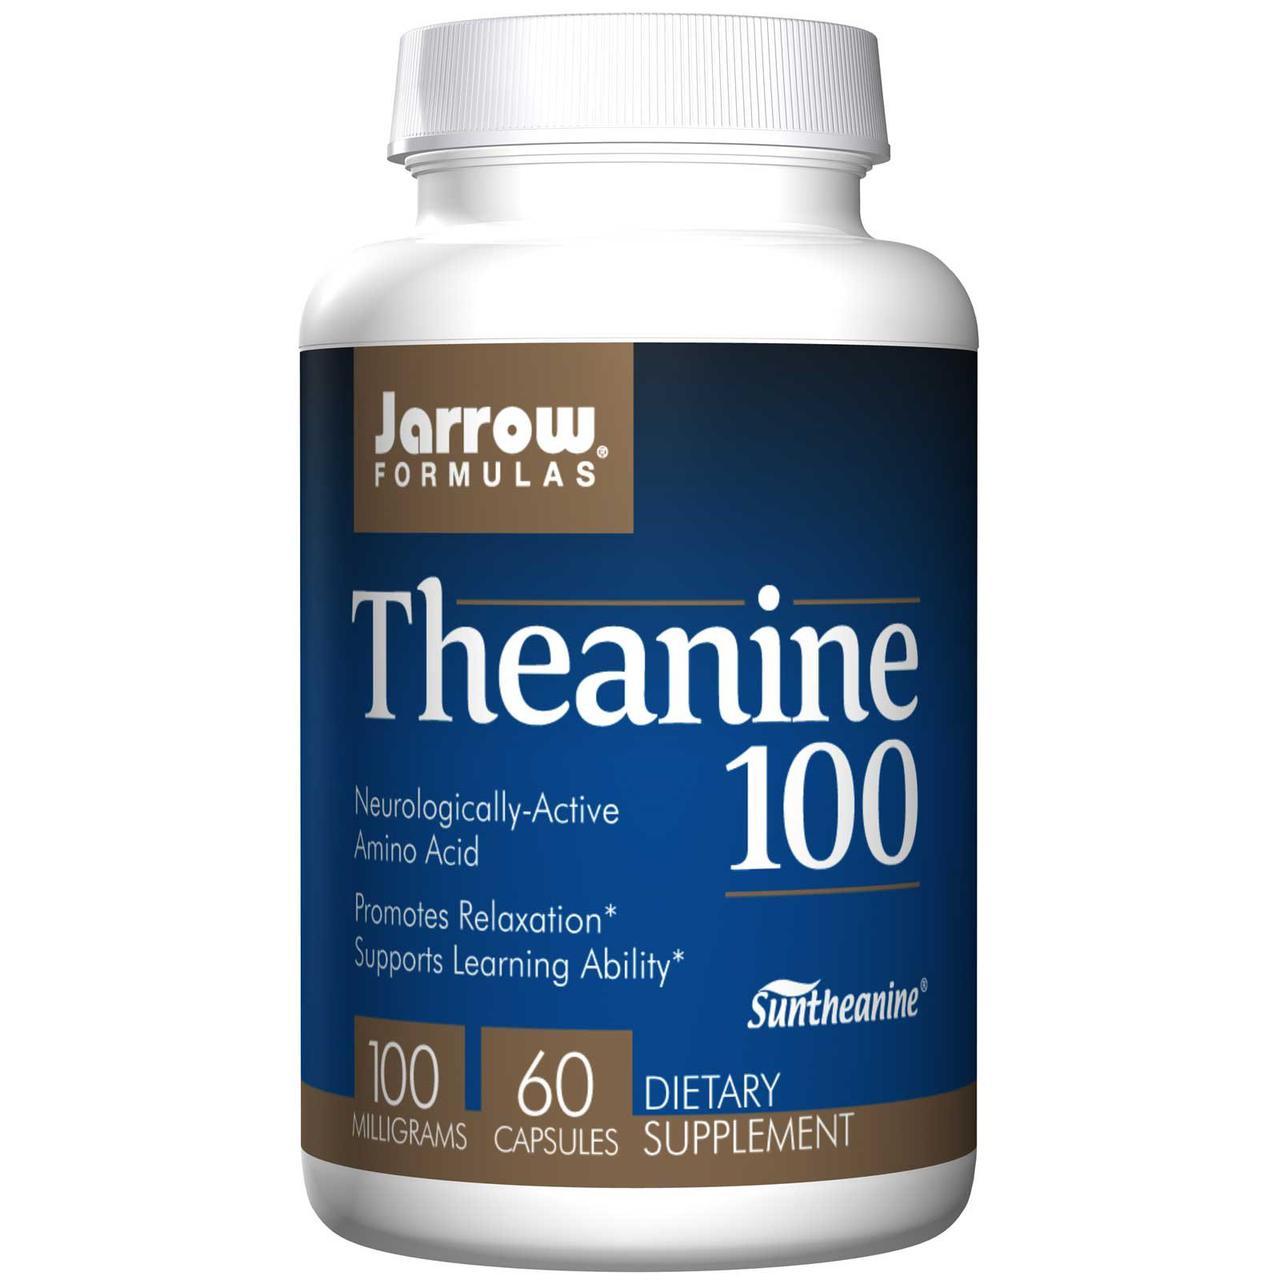 Теанин Jarrow Formulas - Theanine 100 мг (60 капсул)